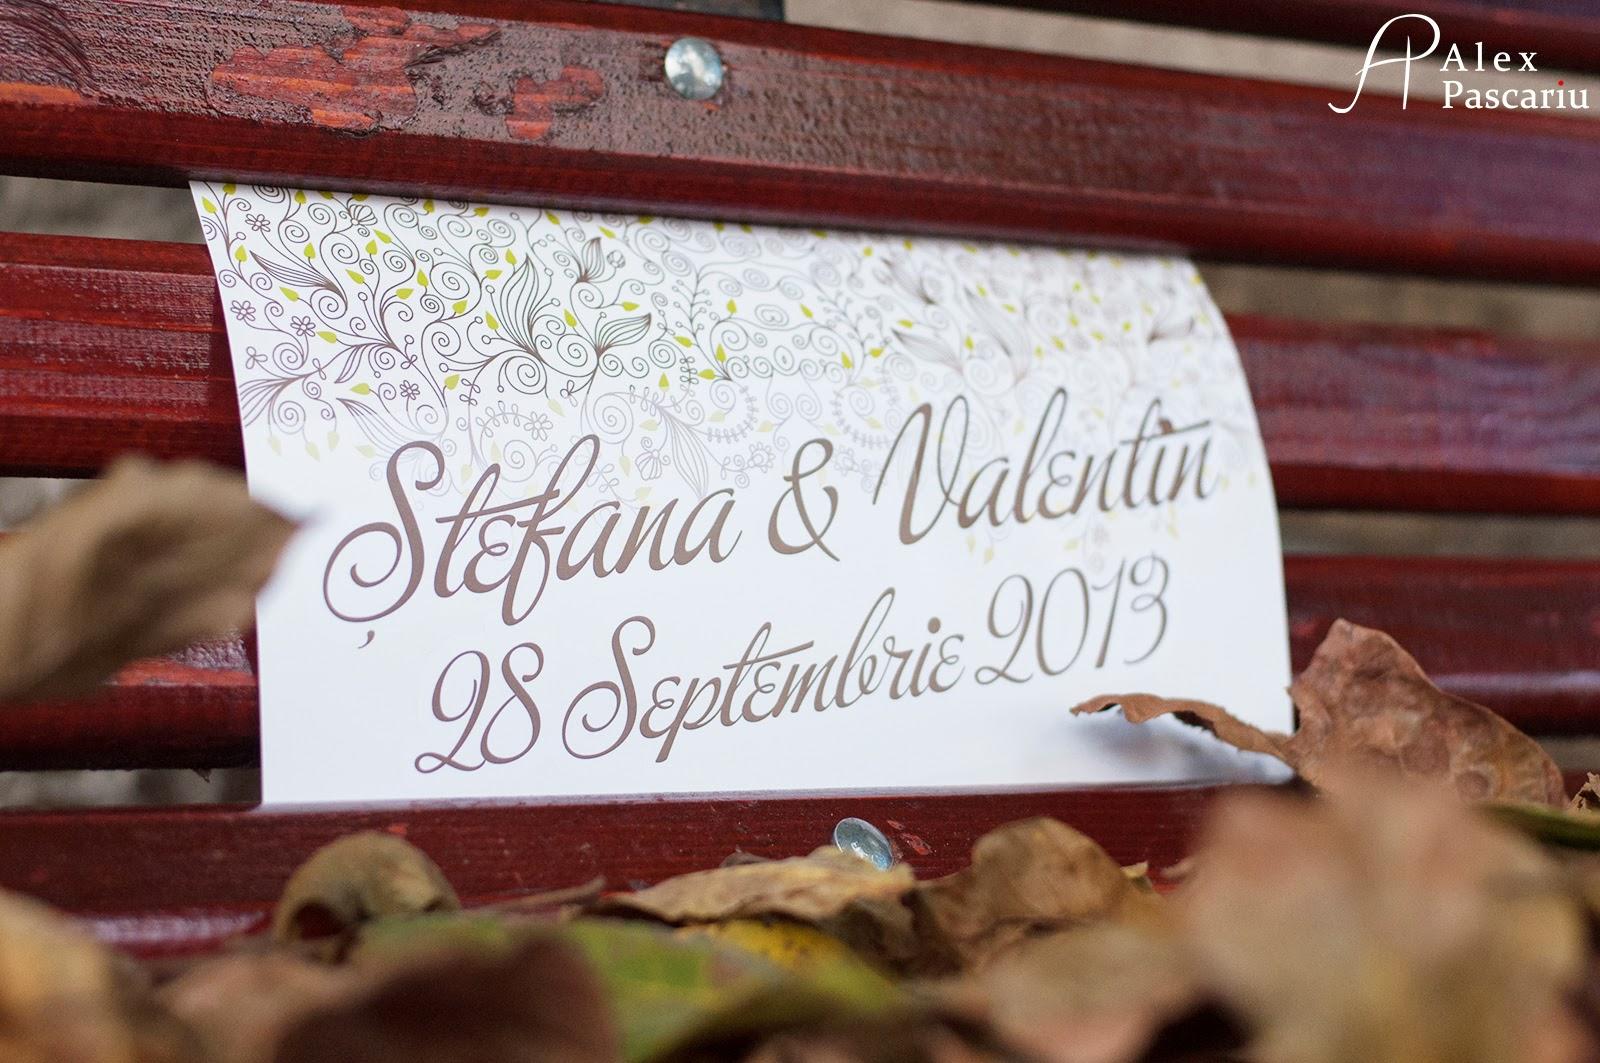 Logodna Stefana & Valentin 13